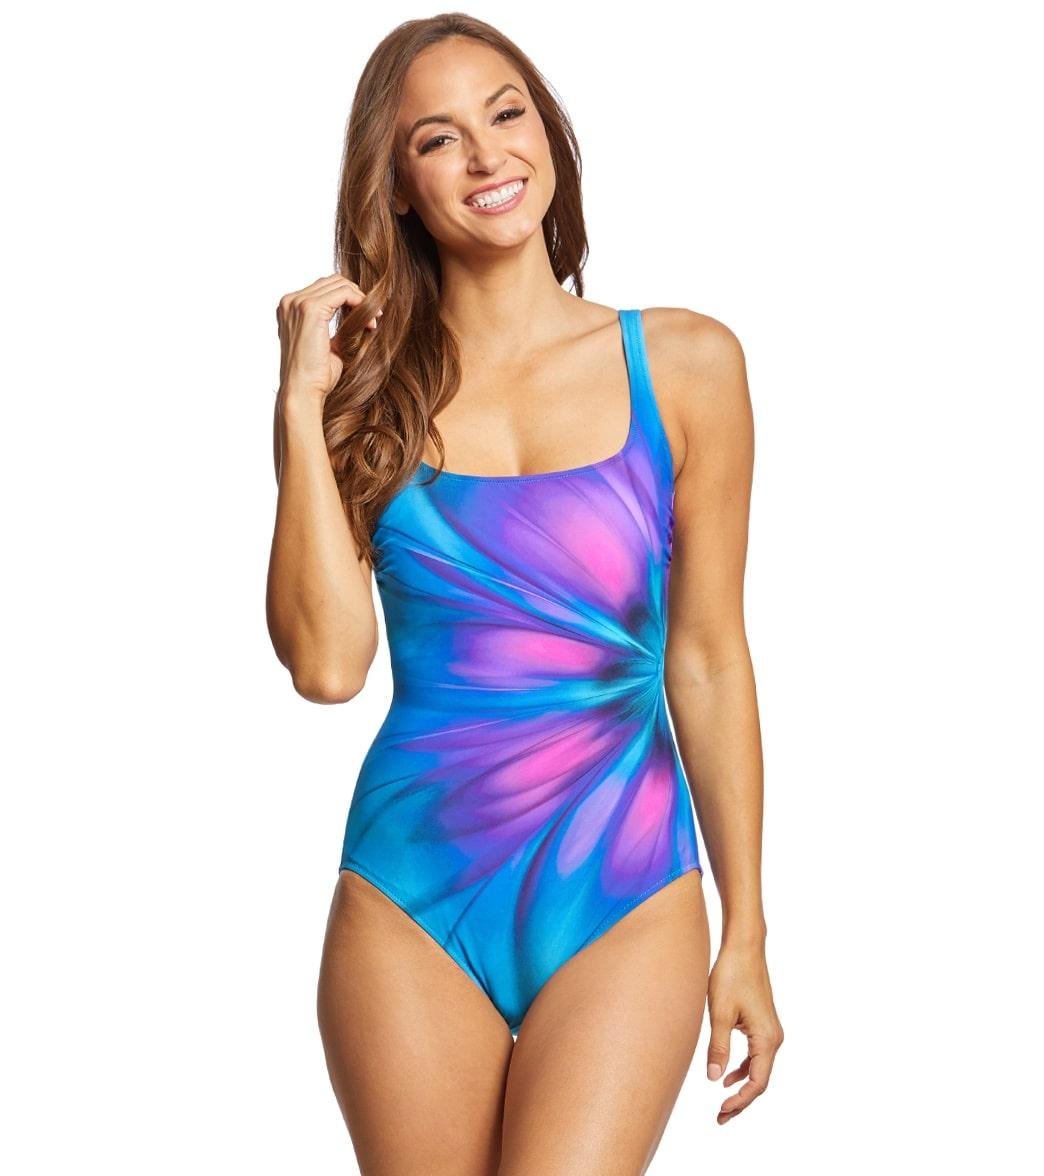 d1a215c1aacbd7 Gottex Belle Fleur Square Neck One Piece Swimsuit at SwimOutlet.com - Free  Shipping